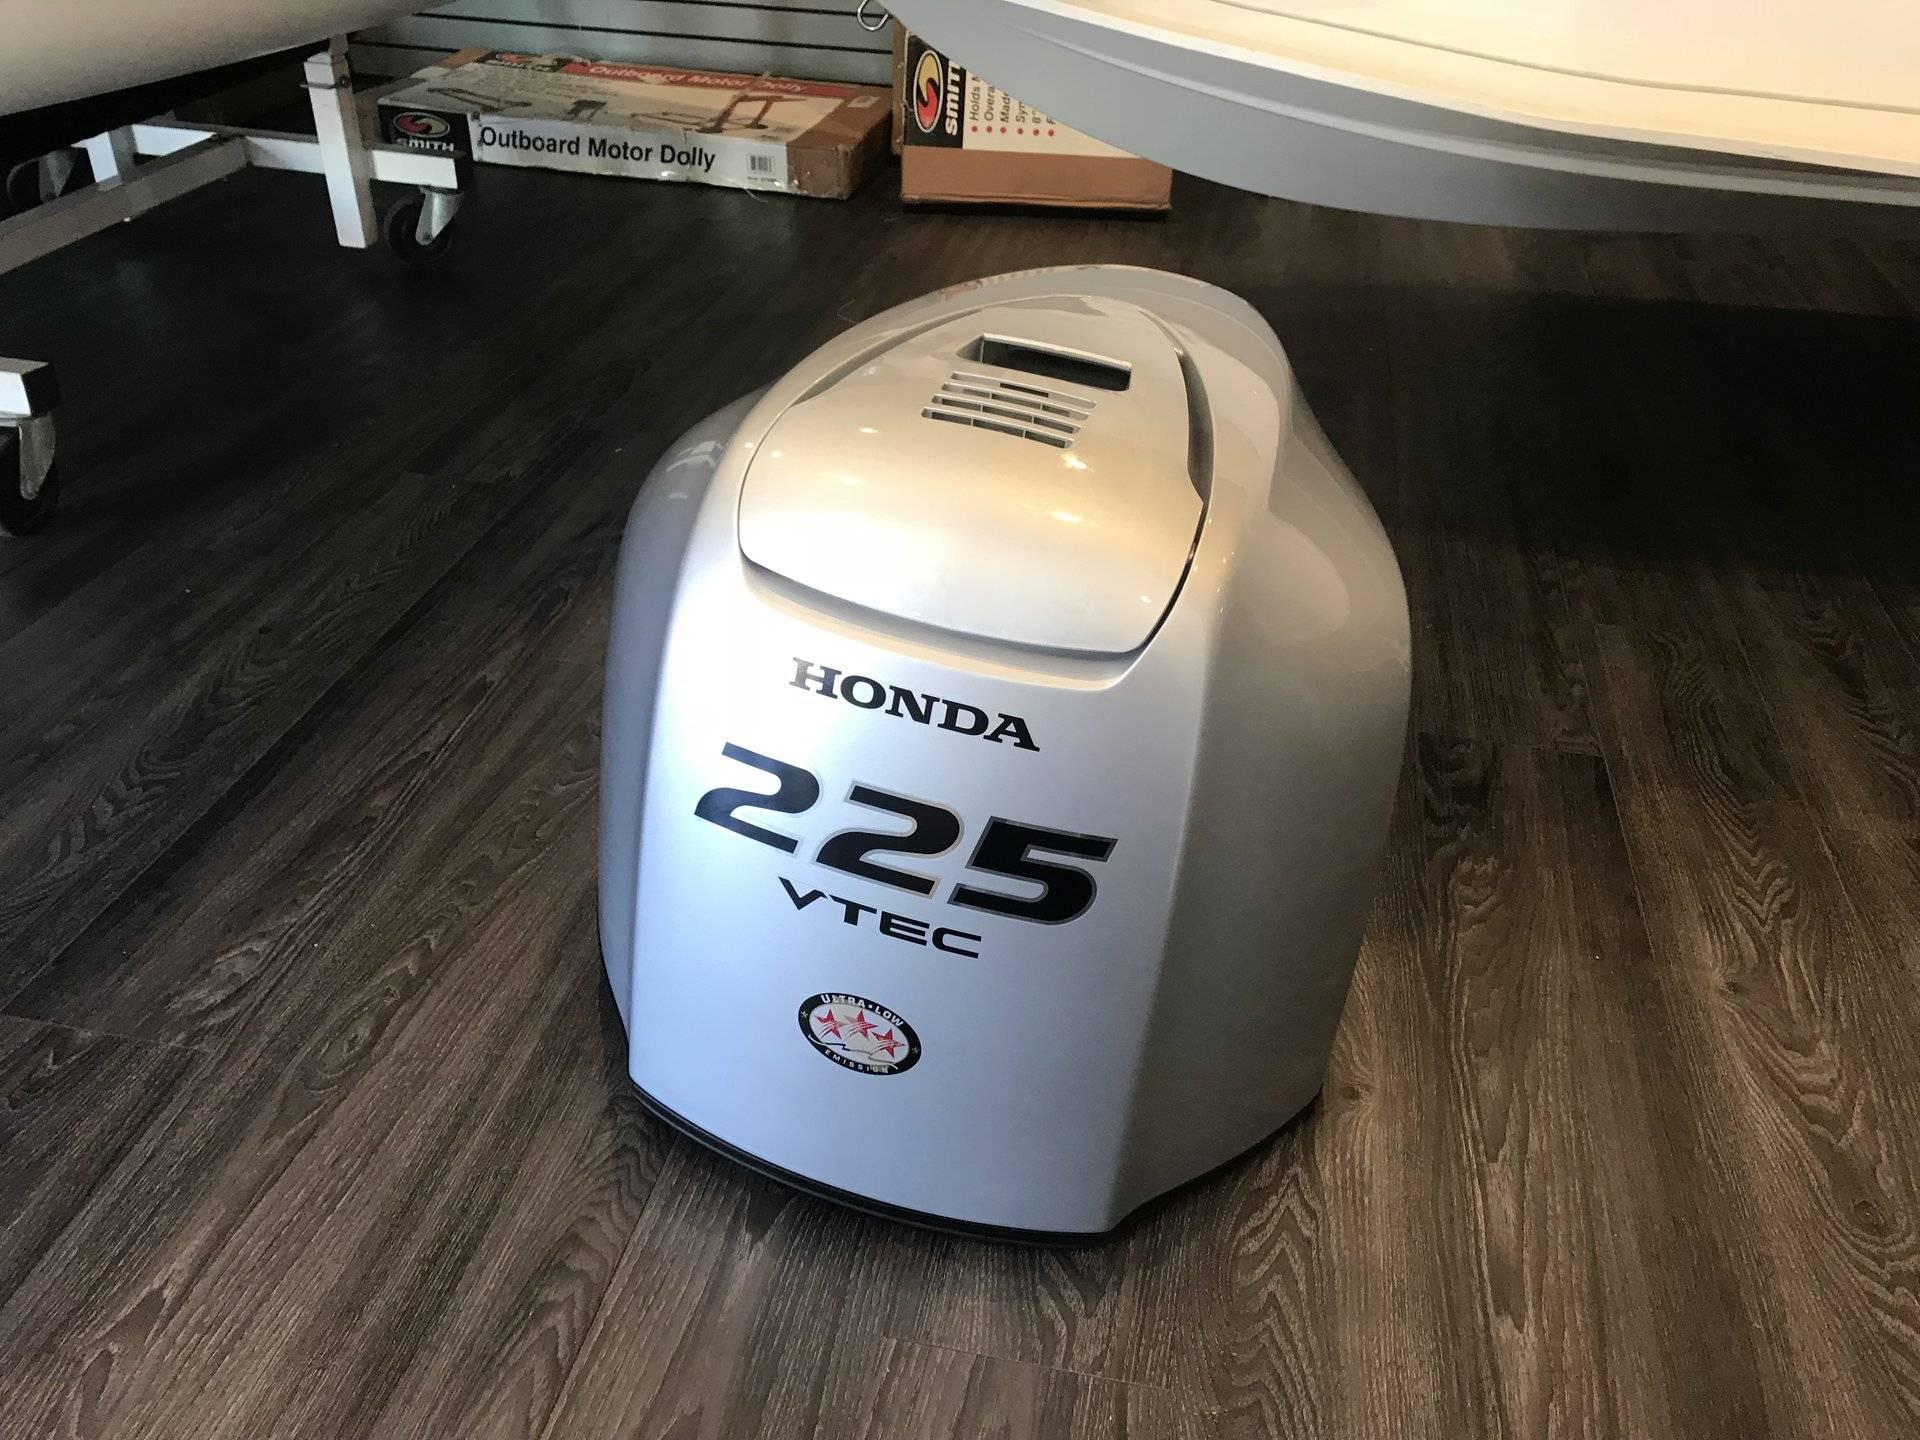 For Sale - Honda 225 Cowling | Bloodydecks